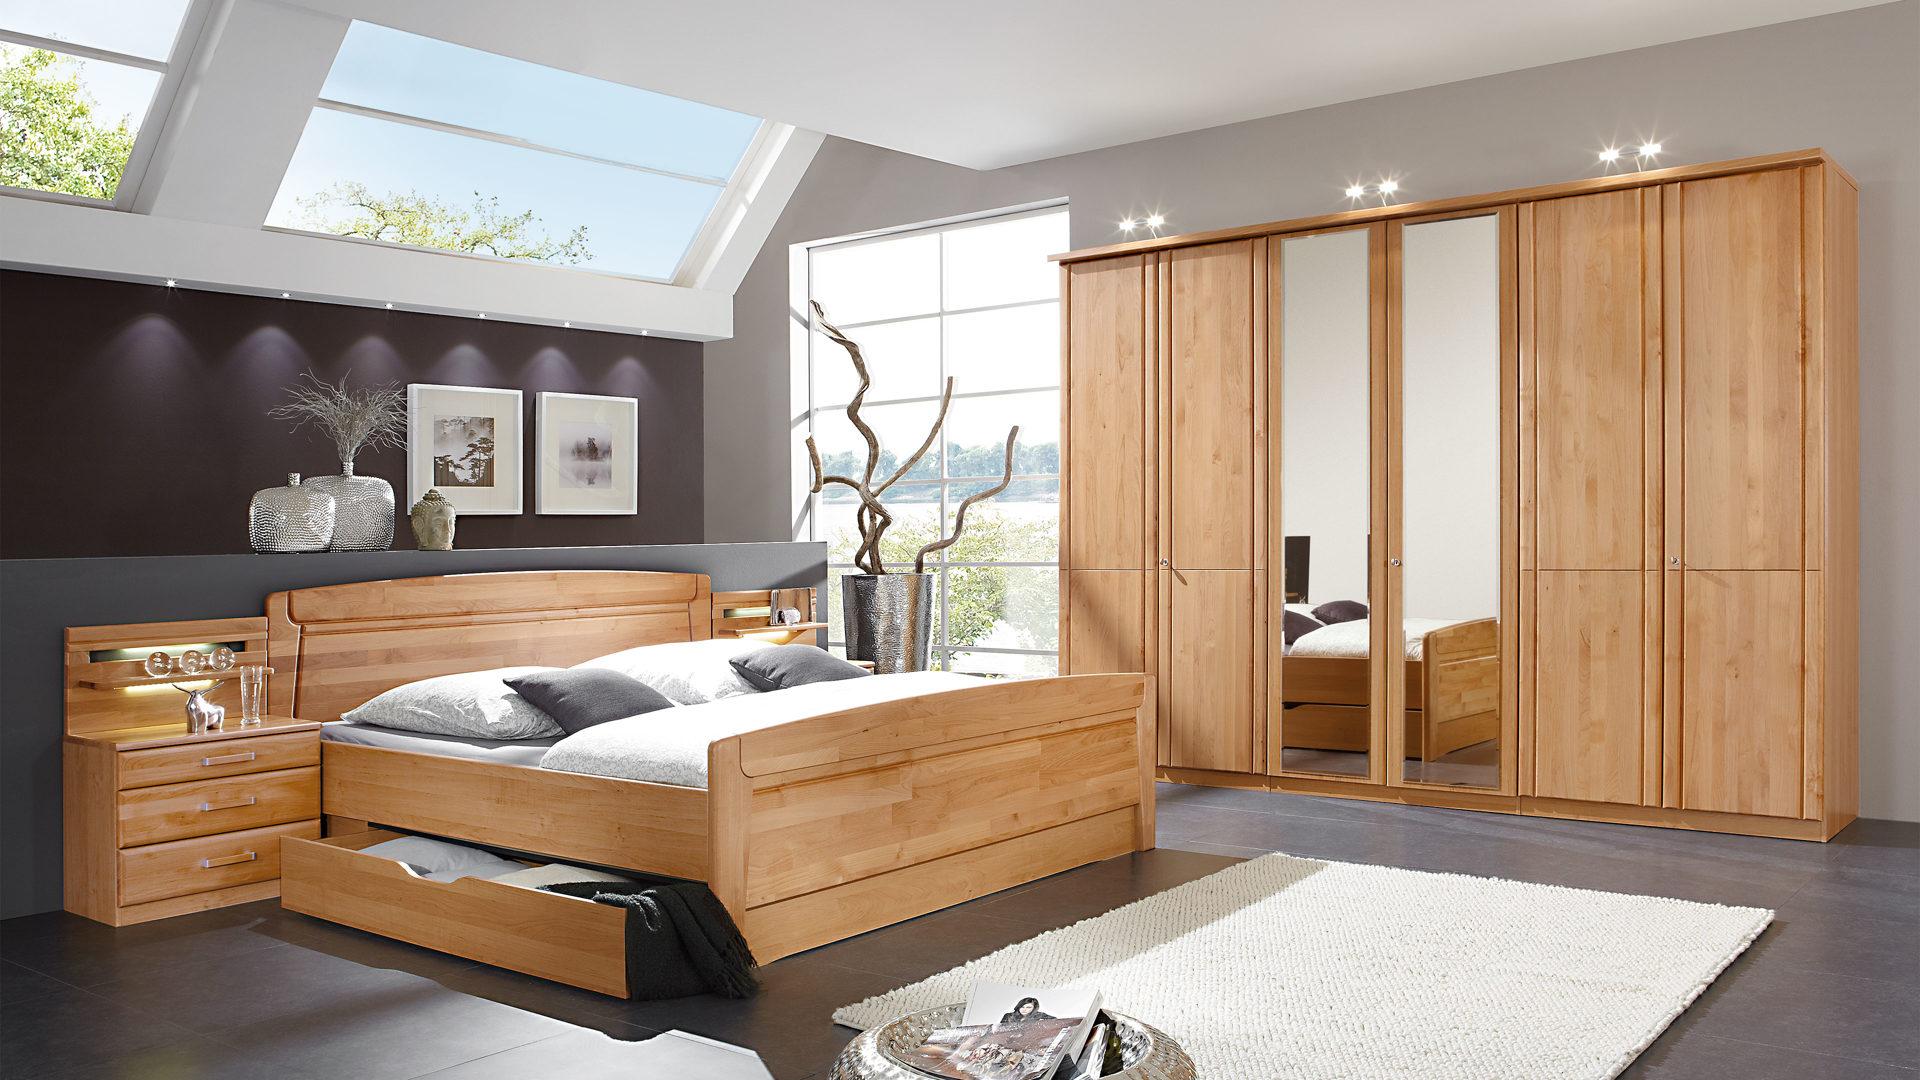 Mobelhaus Thiex Gmbh Raume Schlafzimmer Kommoden Sideboards